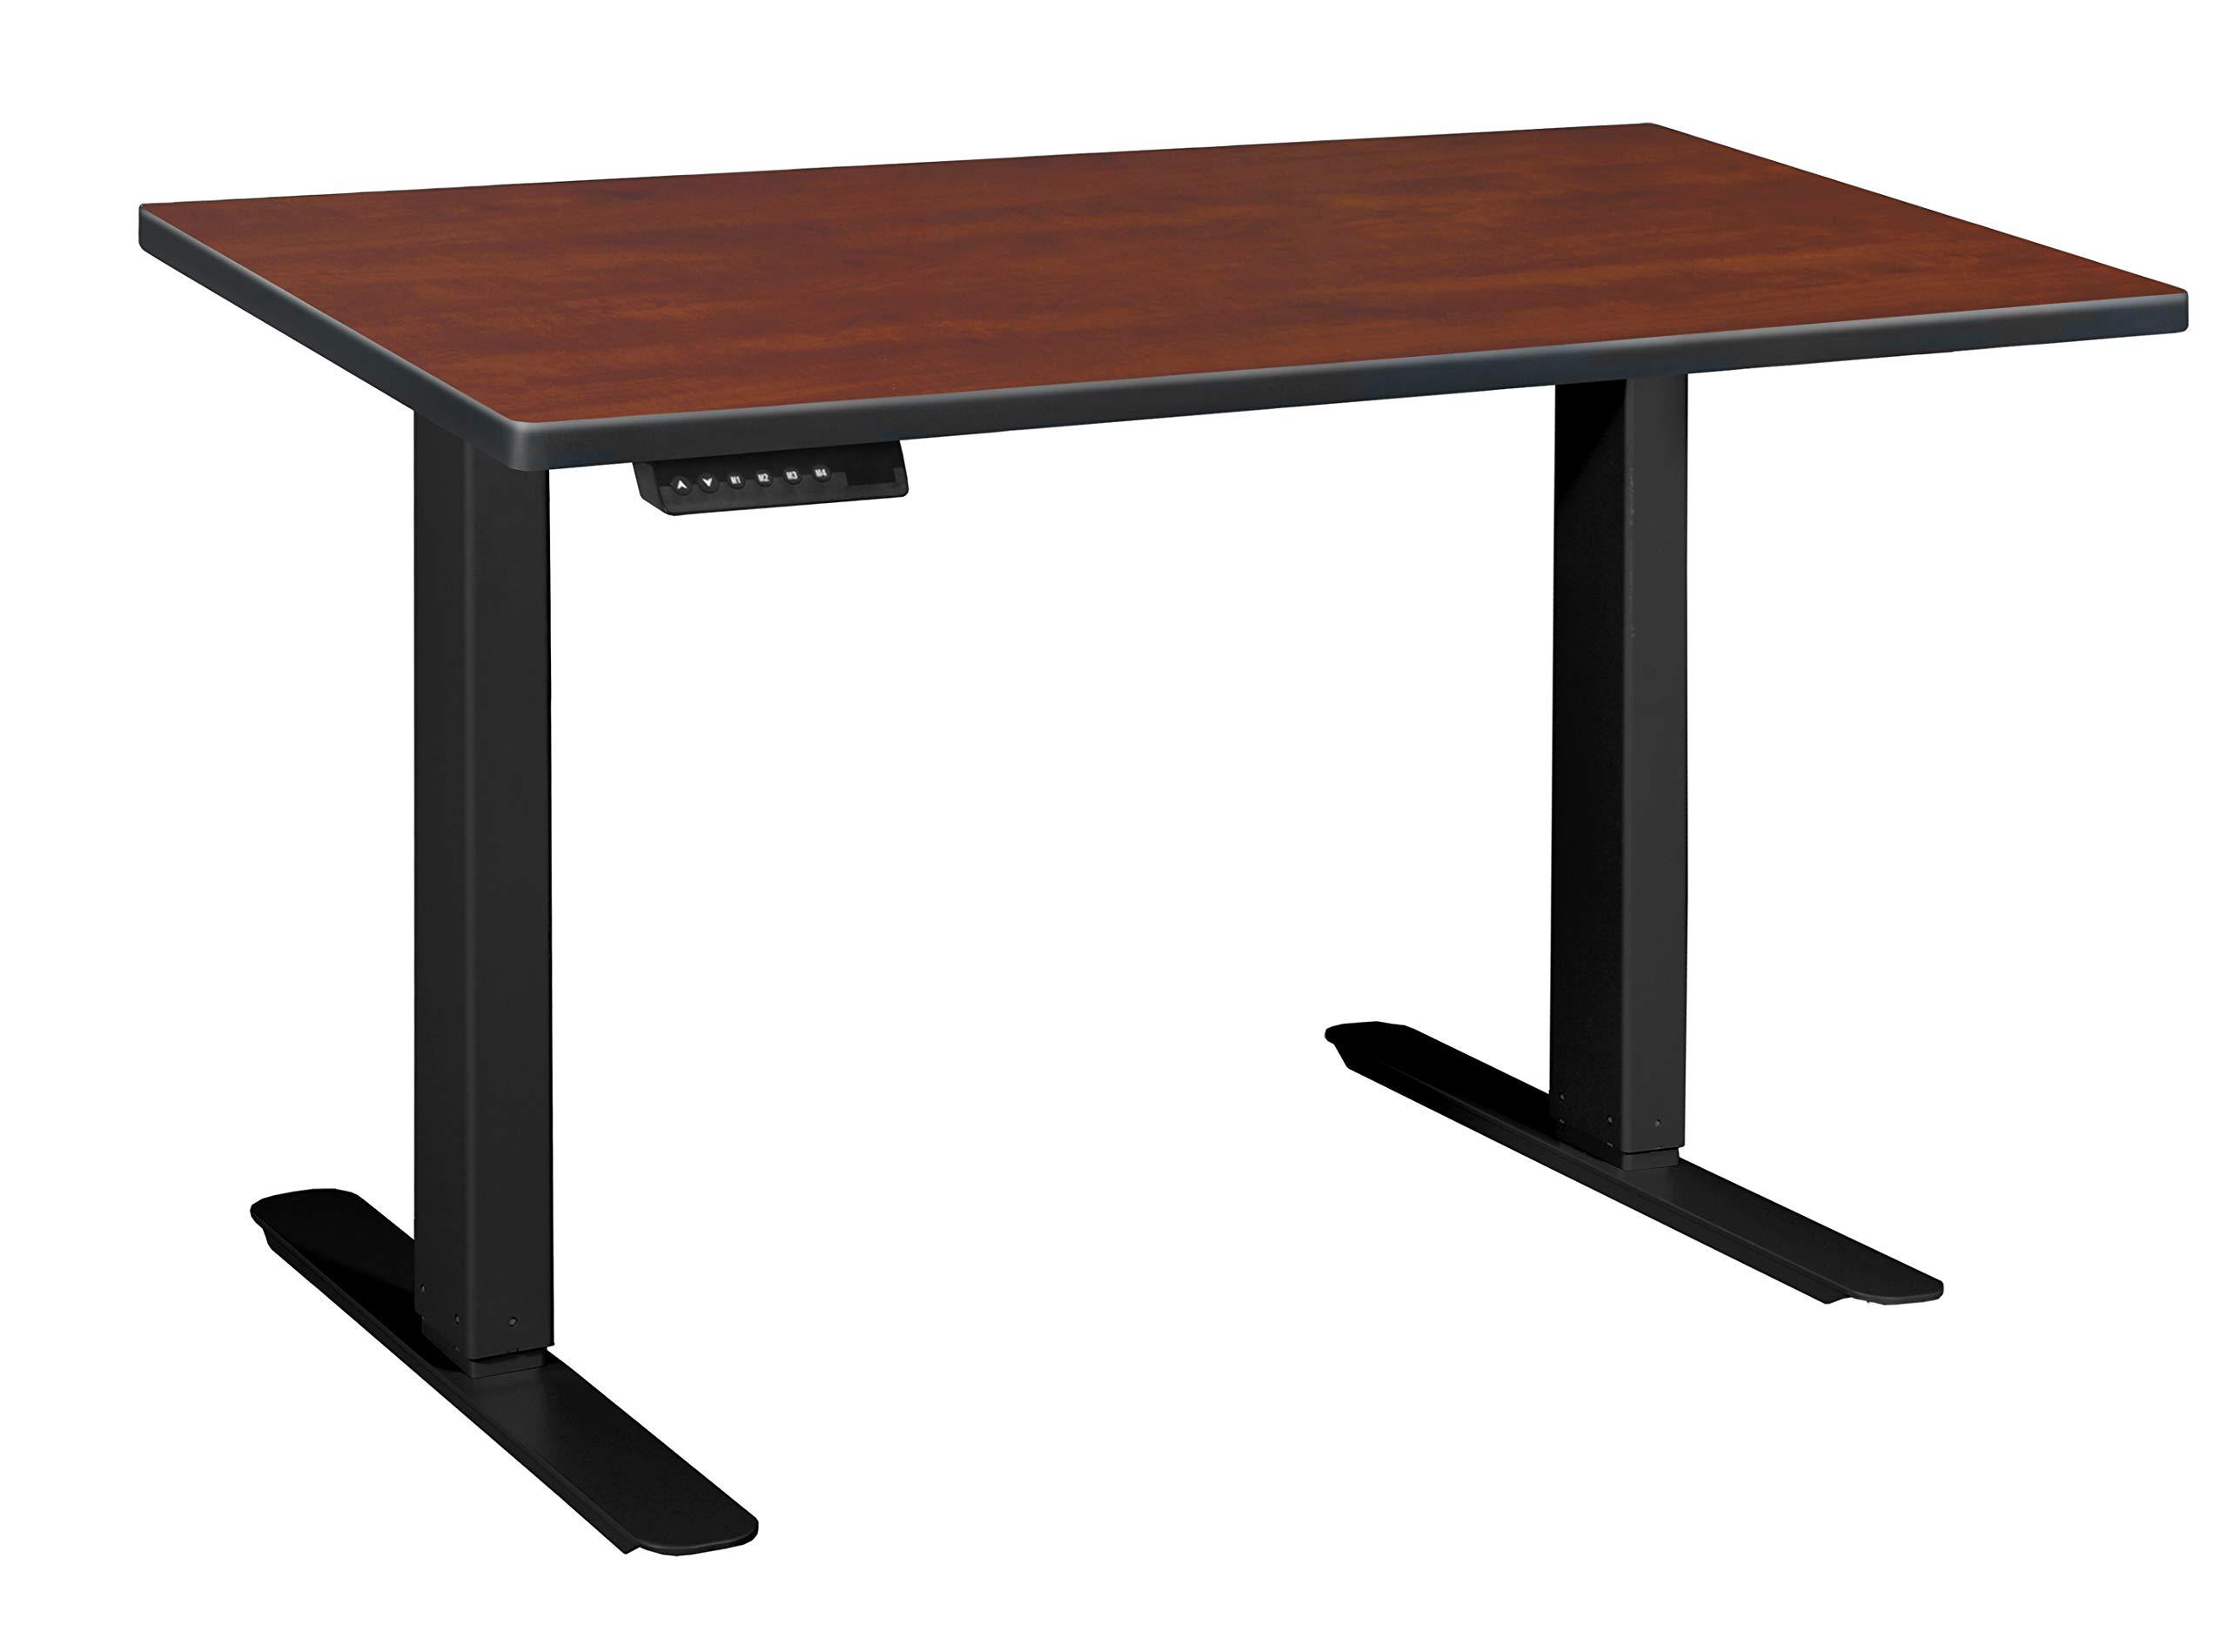 "Regency Esteem Powered One-Touch Height Adjustable Desk/Table, 42"", Cherry/Black"